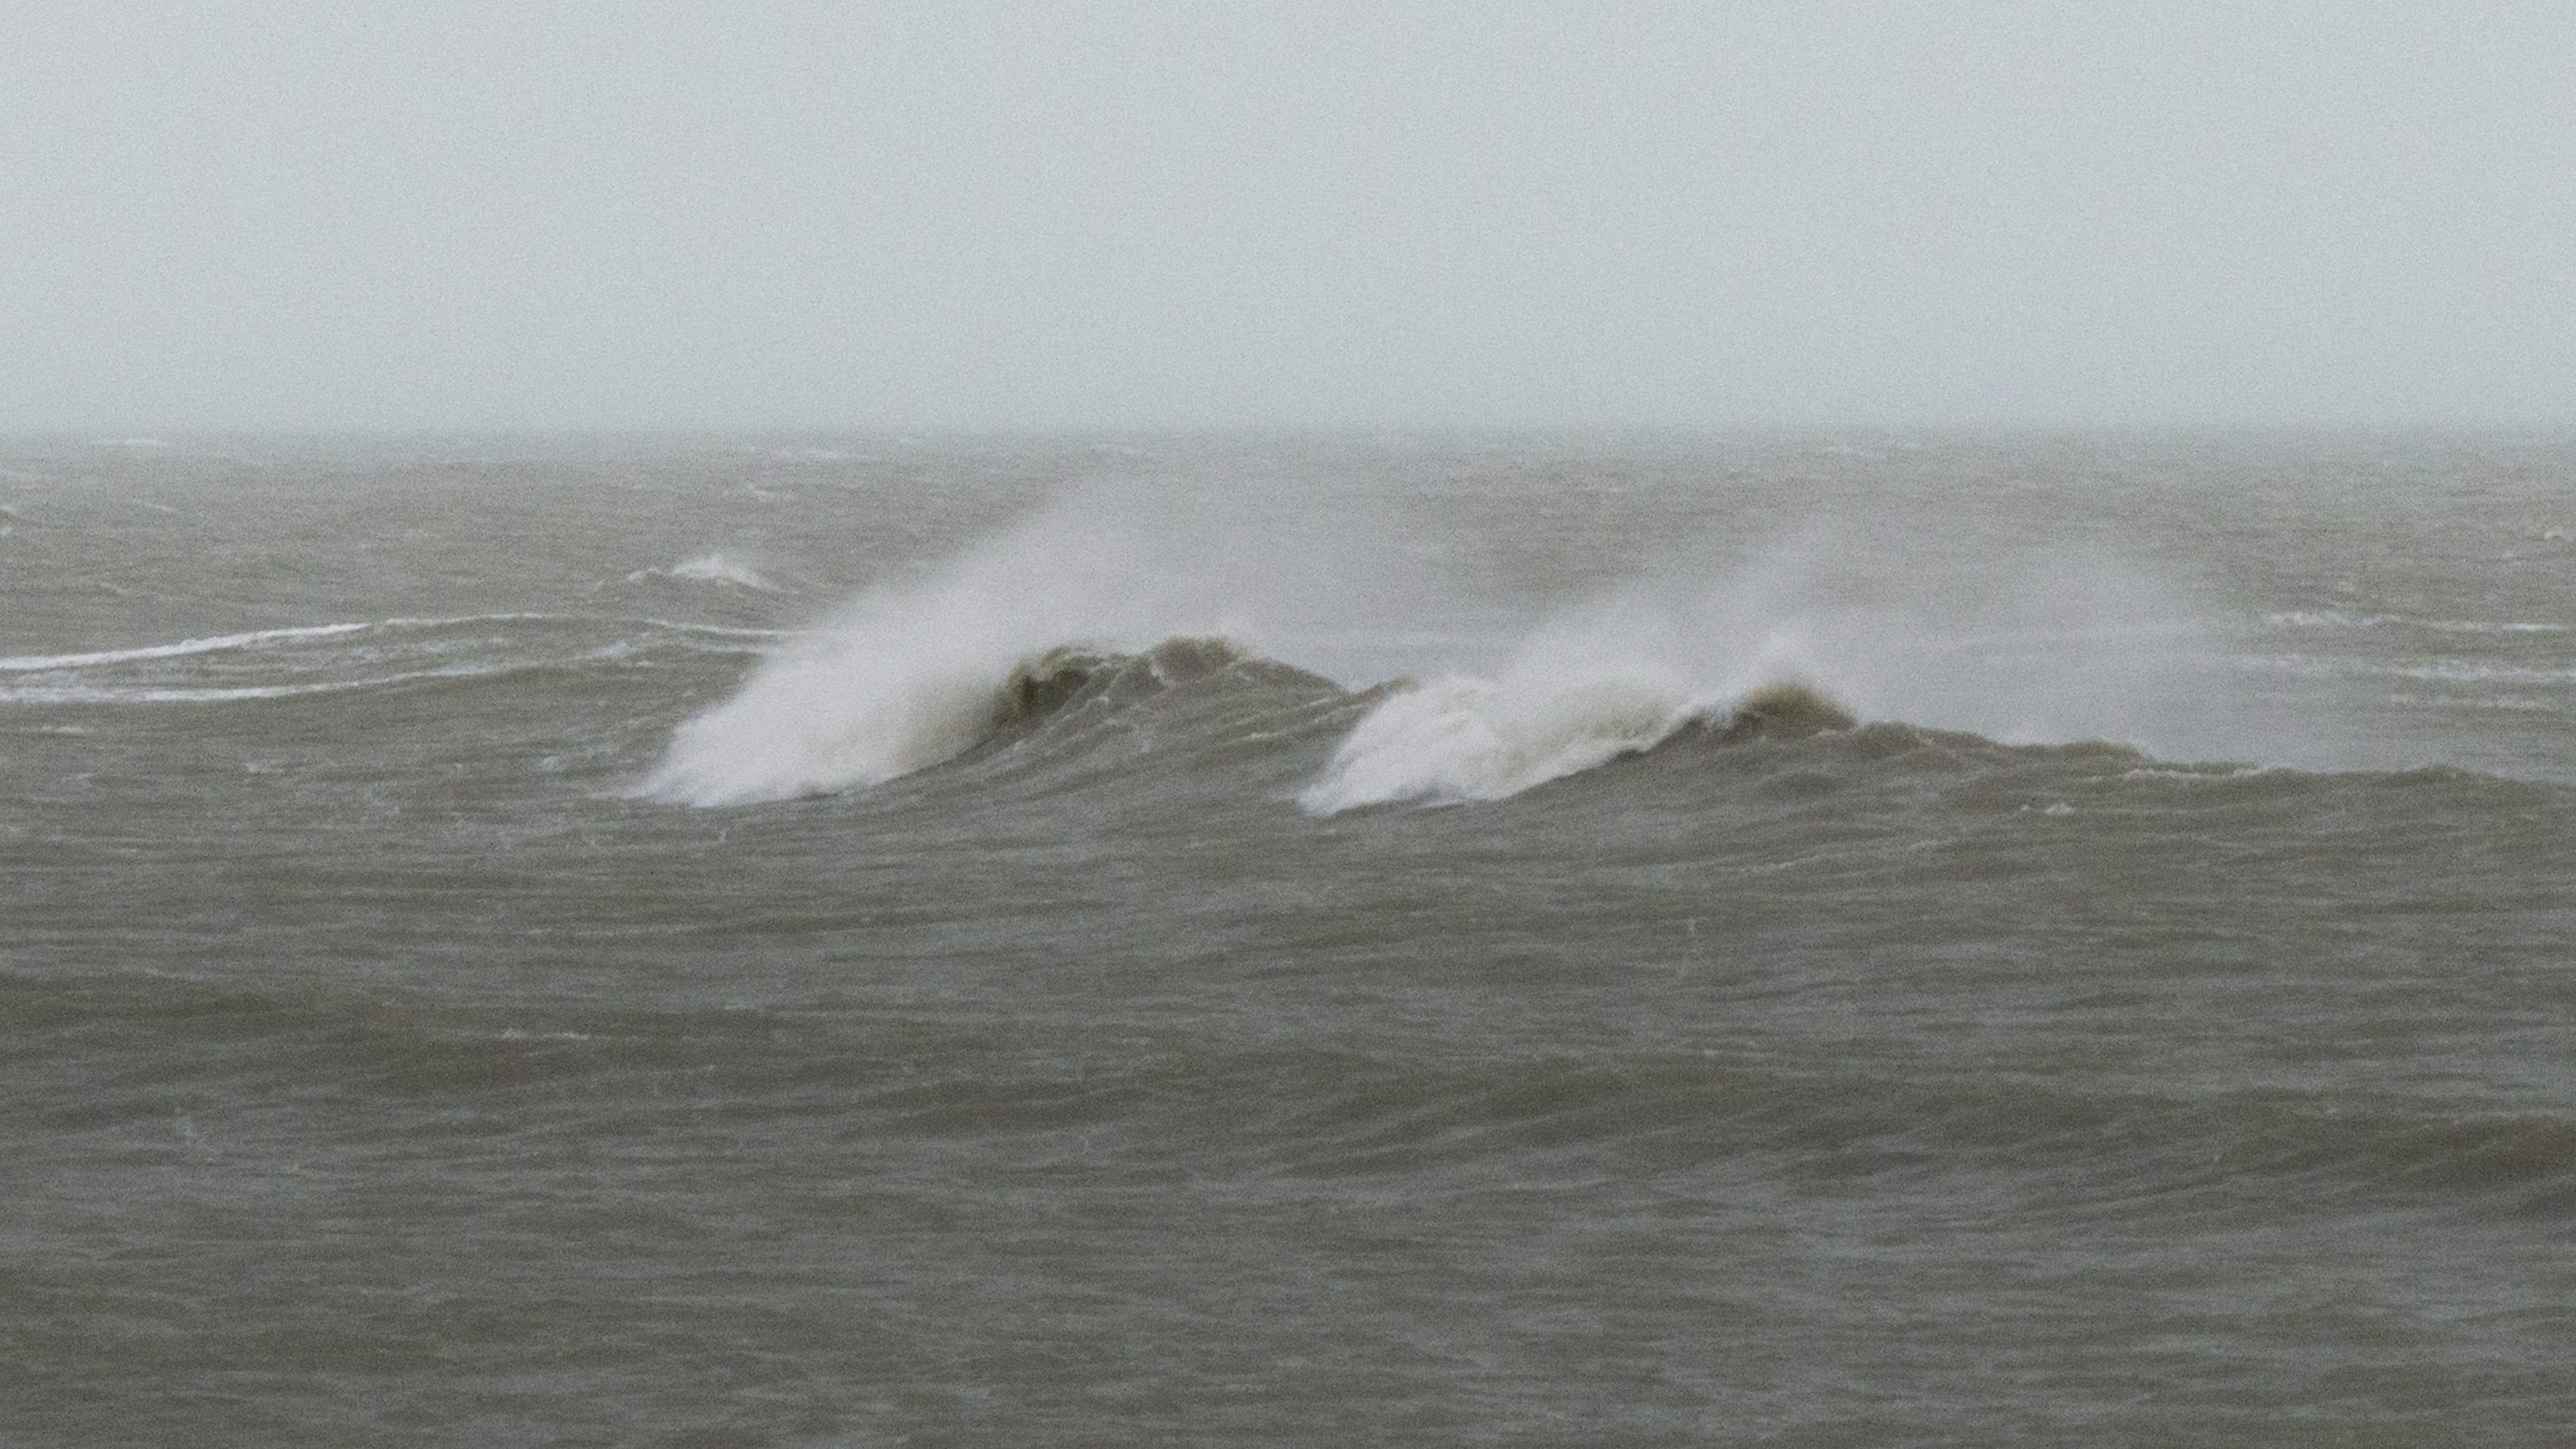 Free picture: beach, sea, seashore, foam, ocean, landscape